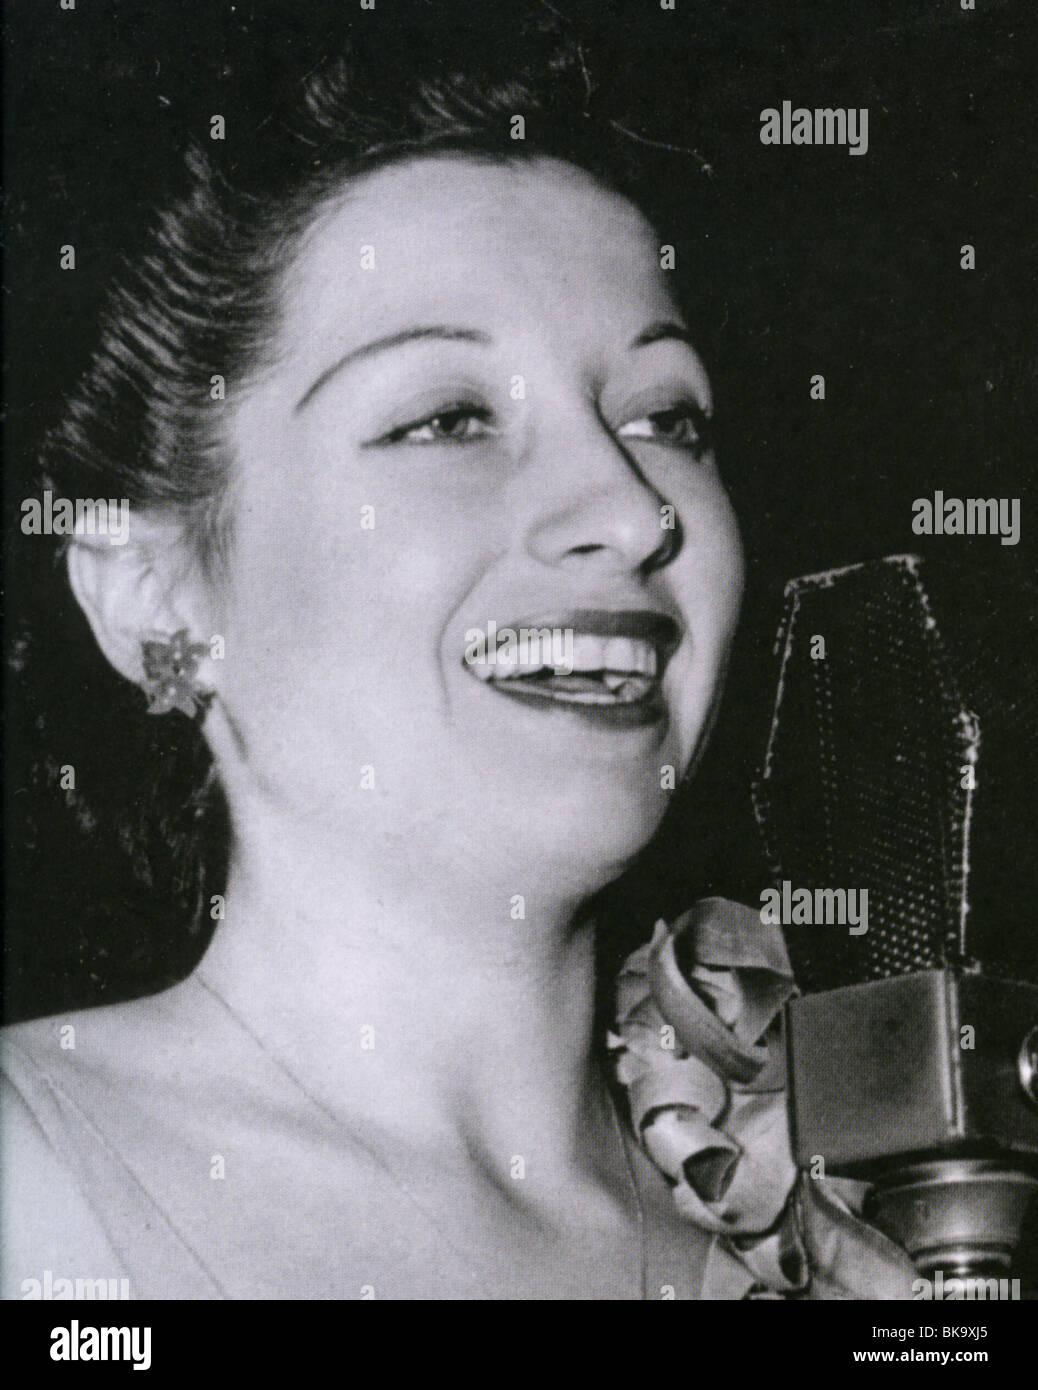 HELEN FORREST  - US jazz singer (1917-1999) - Stock Image